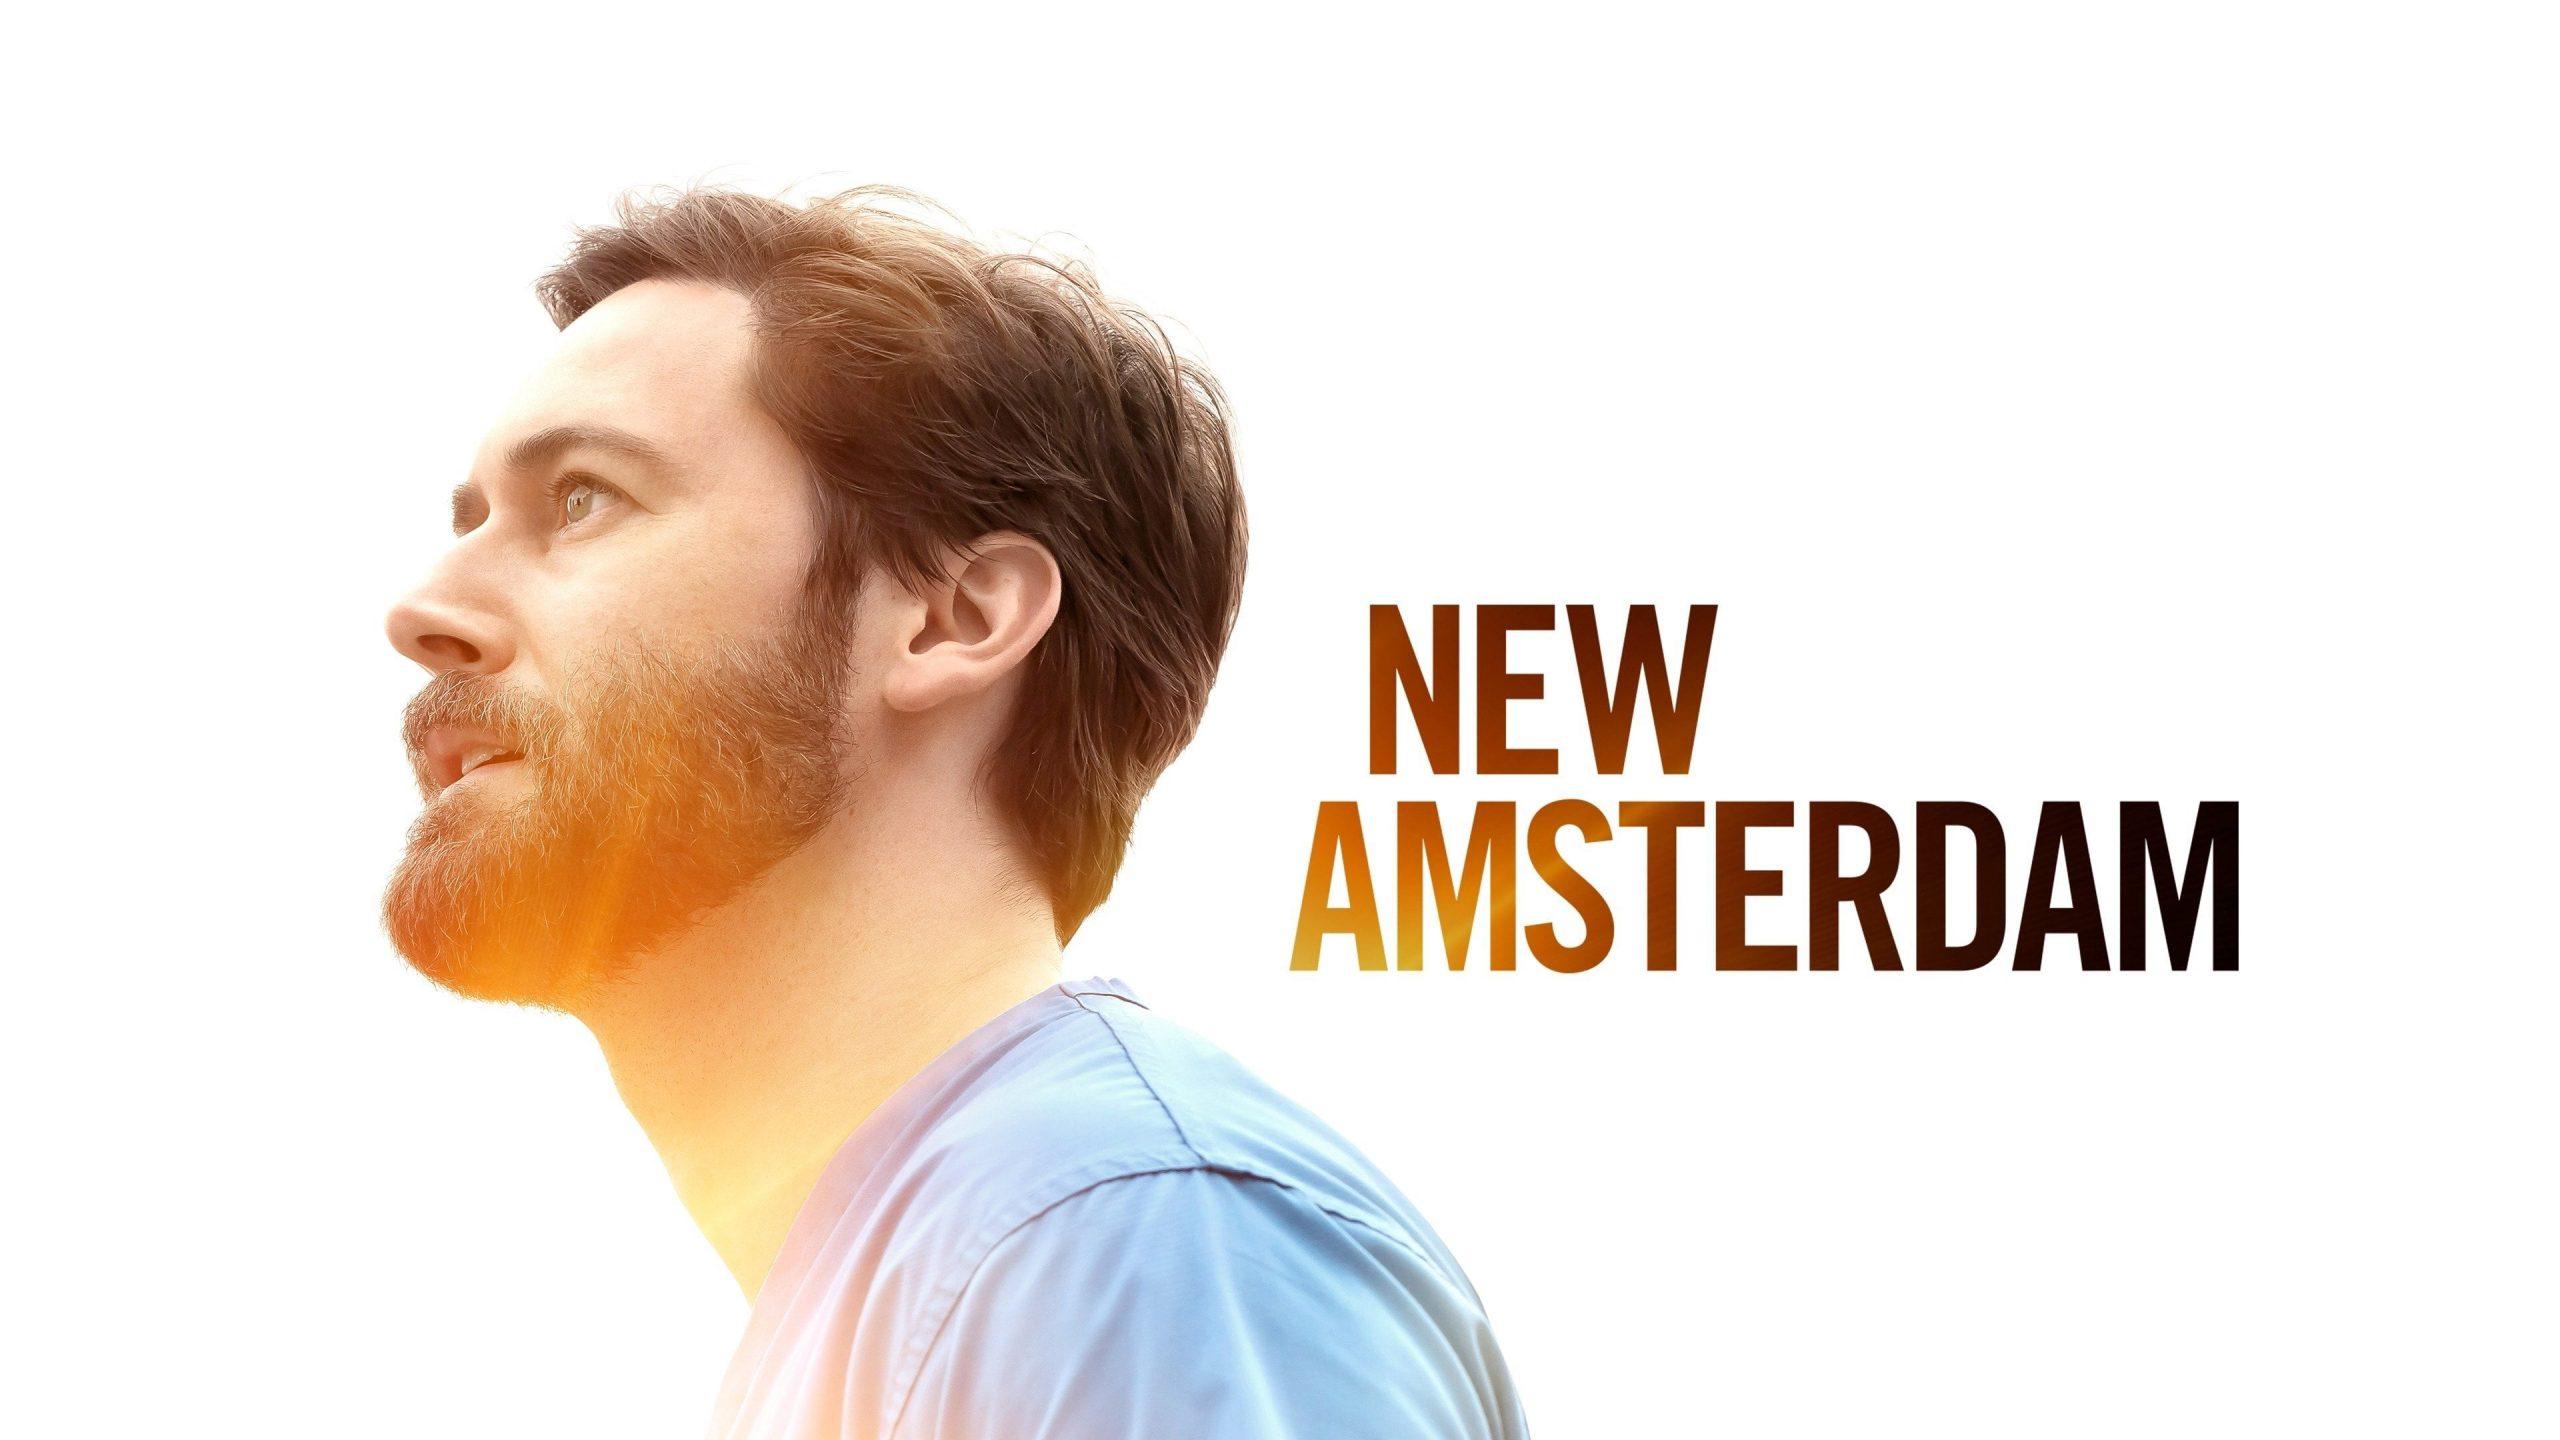 Preview: New Amsterdam Season 3 Episode 4